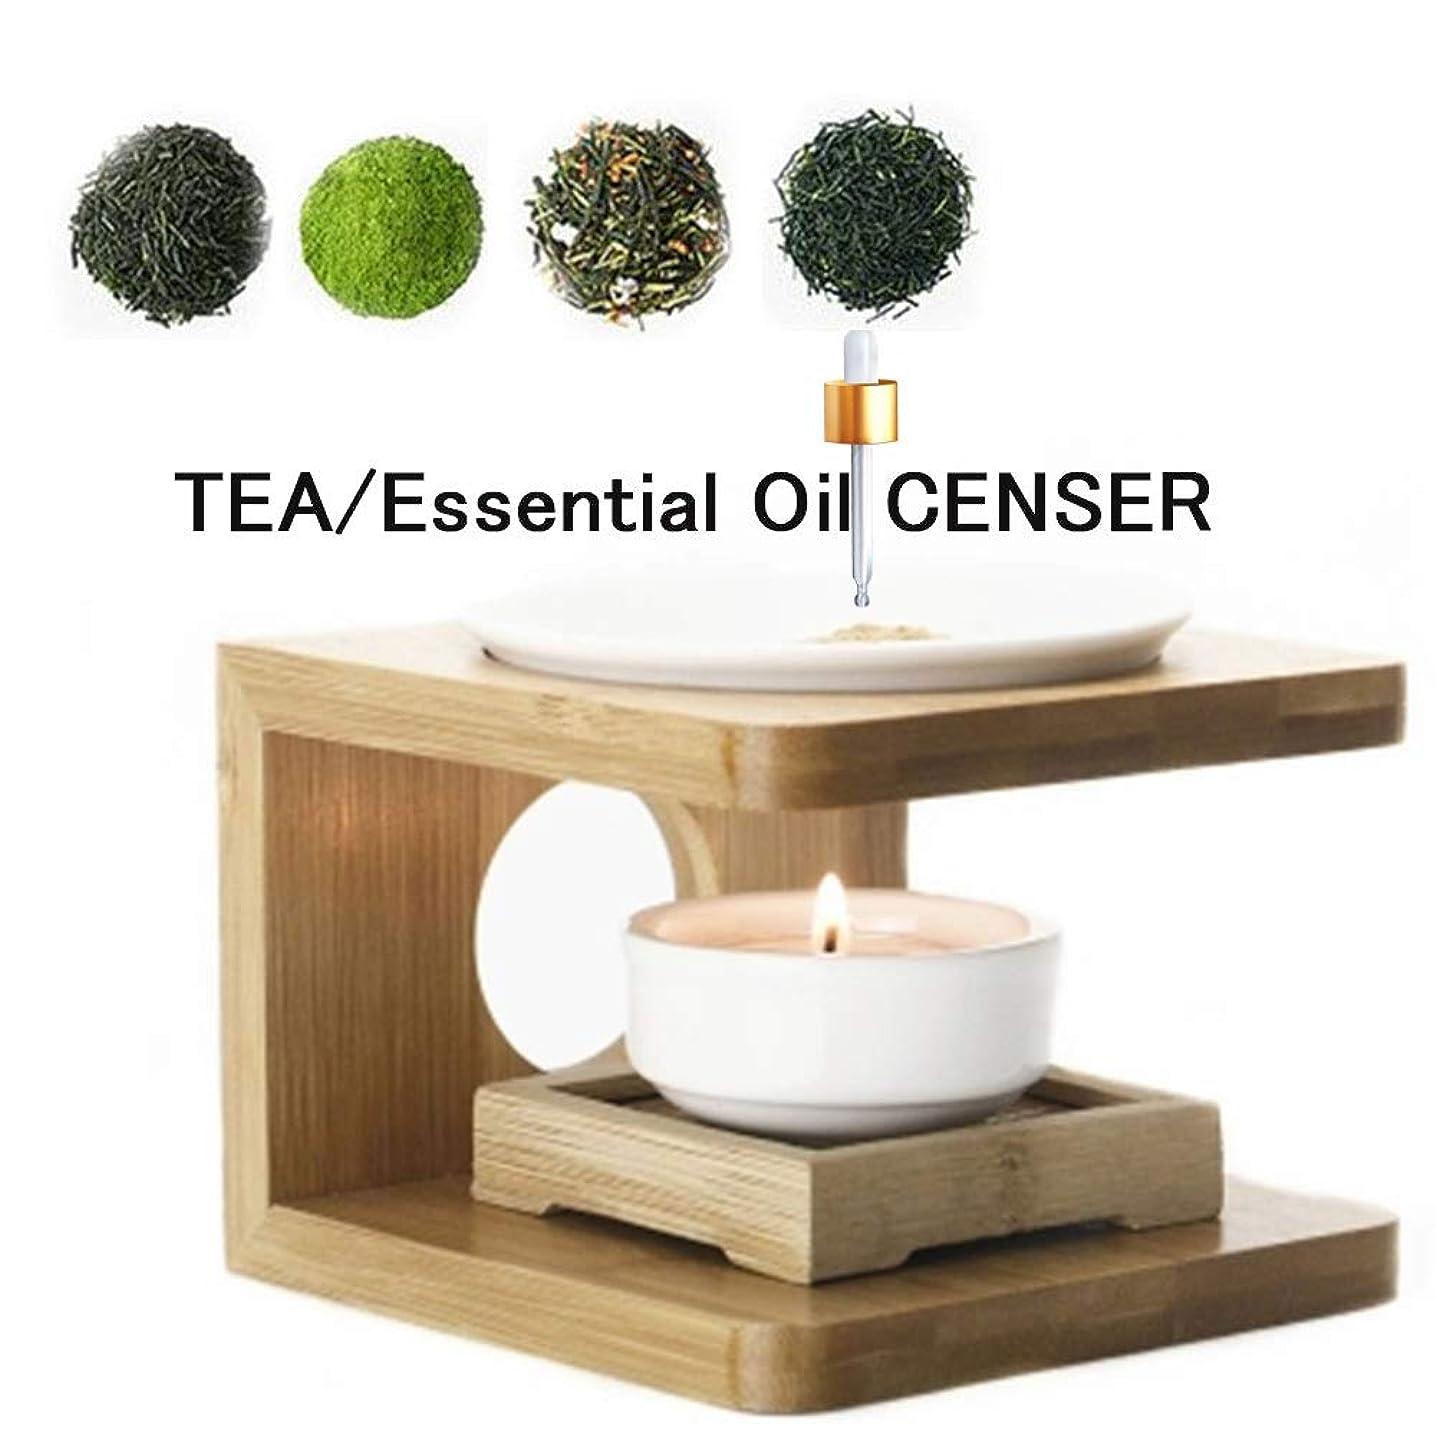 ZEINSINN Tea Burner Essential Oil Aroma Light Coffee Aroma Office Yoga Meditation spa Supplies Aromatherapy Burner Set Candle Warmers Porcelain Decoration